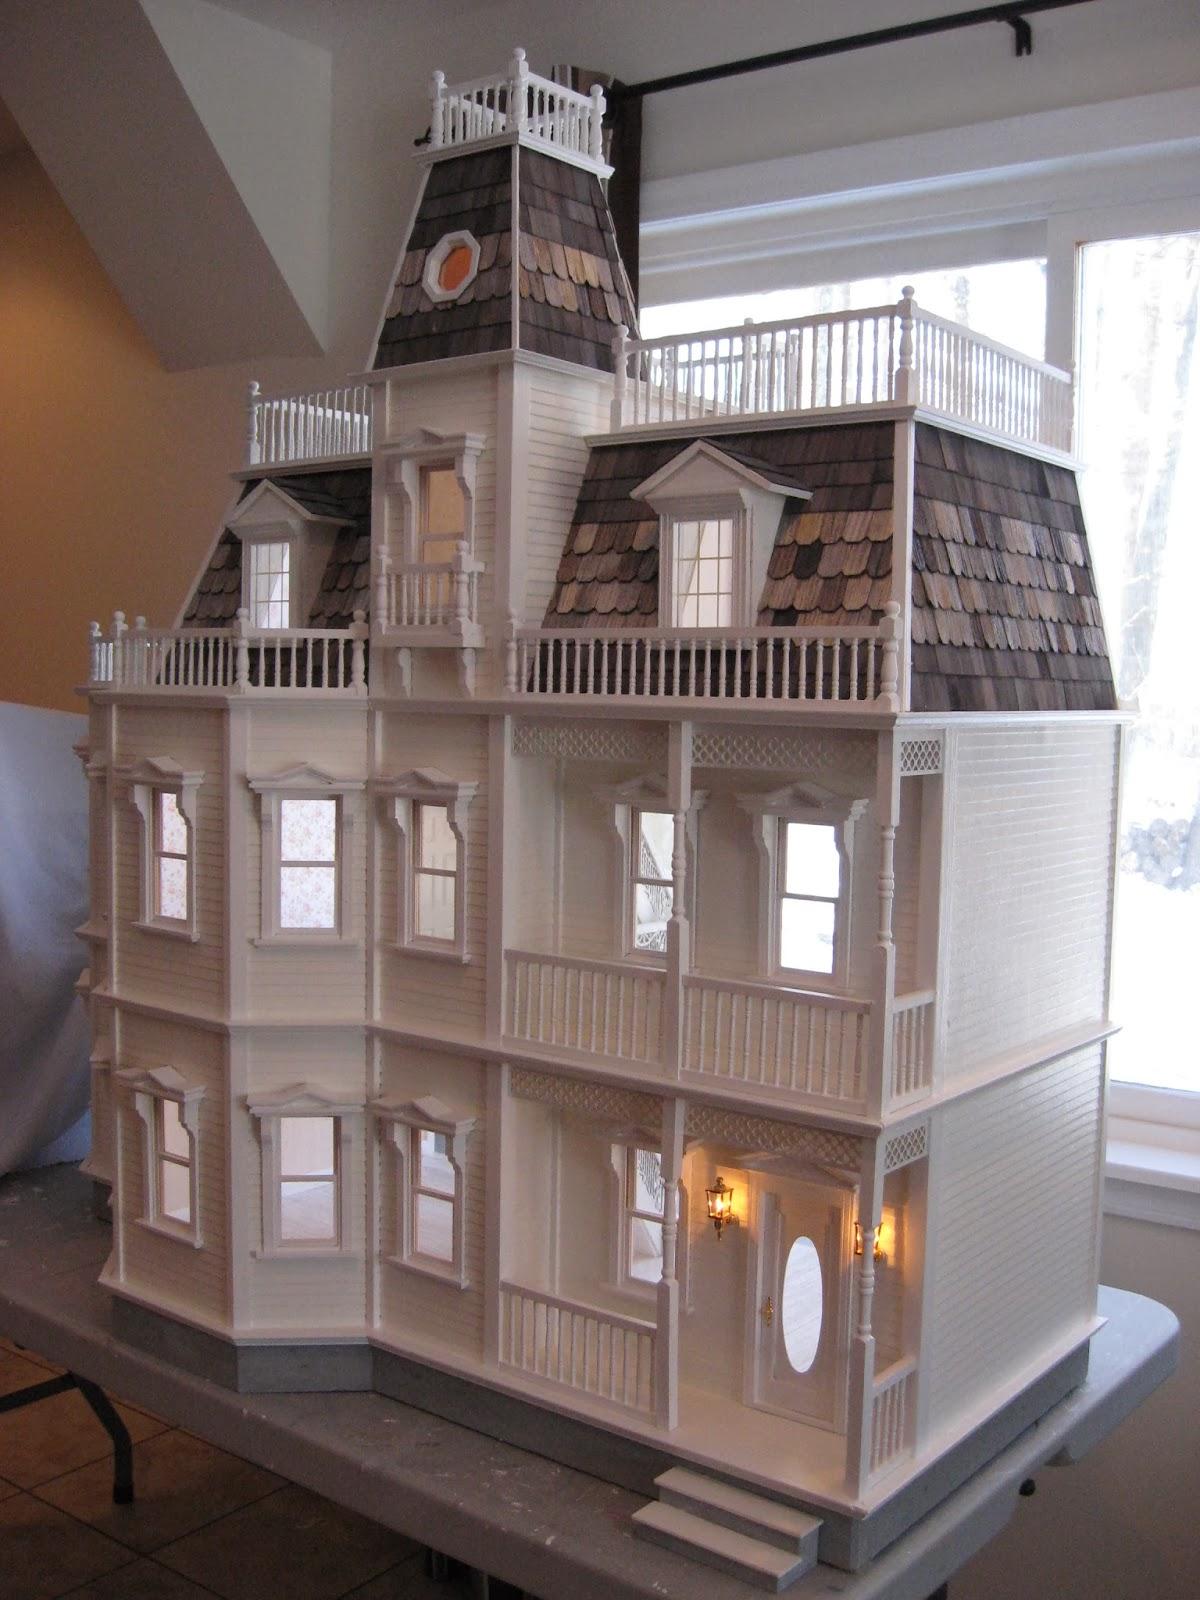 Little Darlings Dollhouses Customized Newport Dollhouse